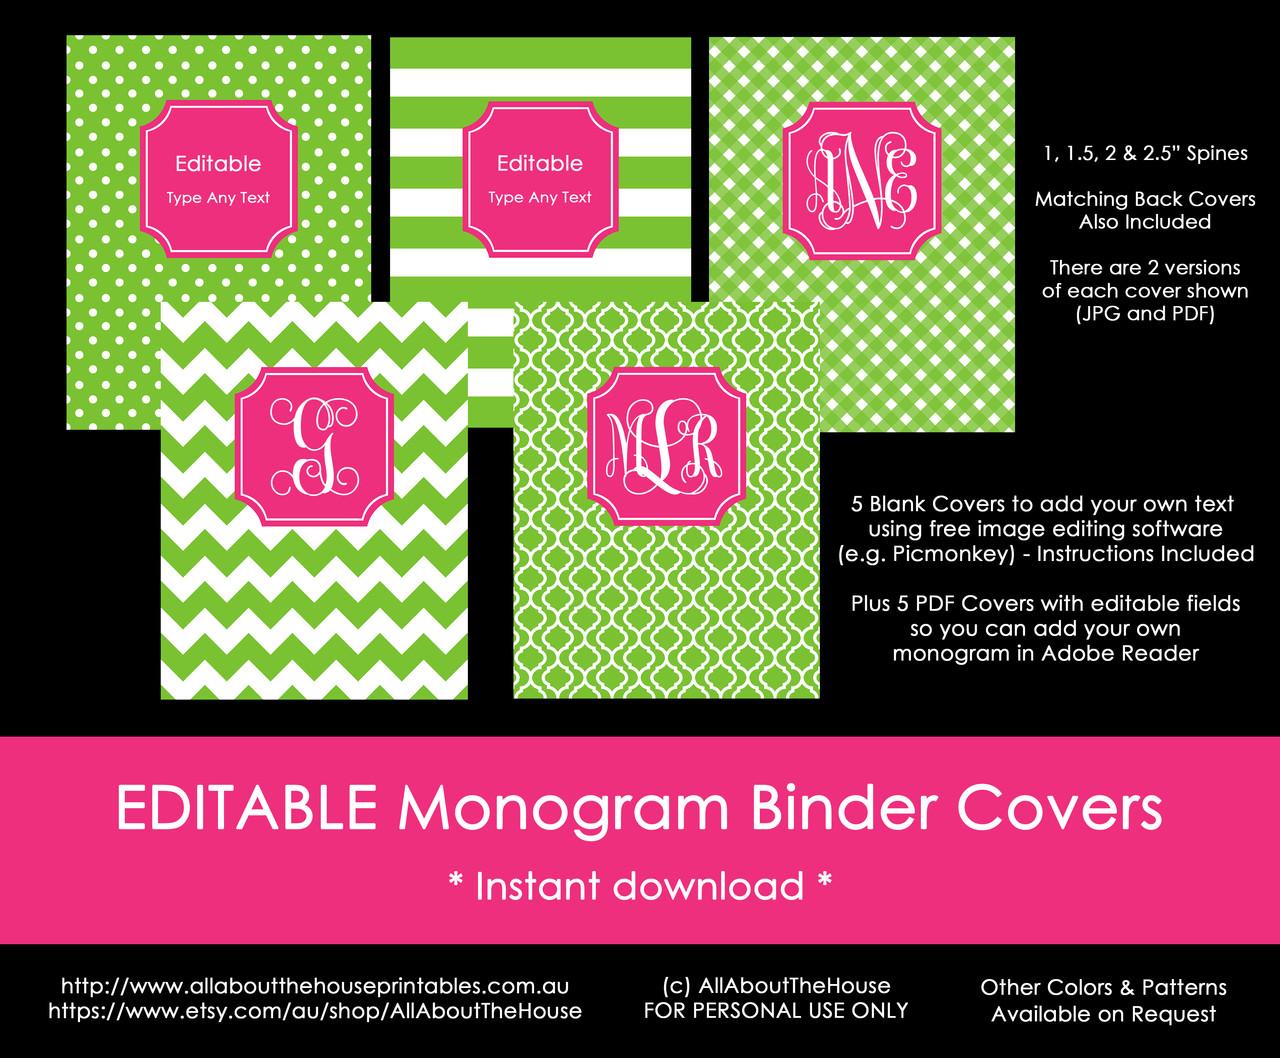 image regarding Binder Covers Printable named EDITABLE Monogram Binder Addresses - 40 (eco-friendly), 81 (purple)